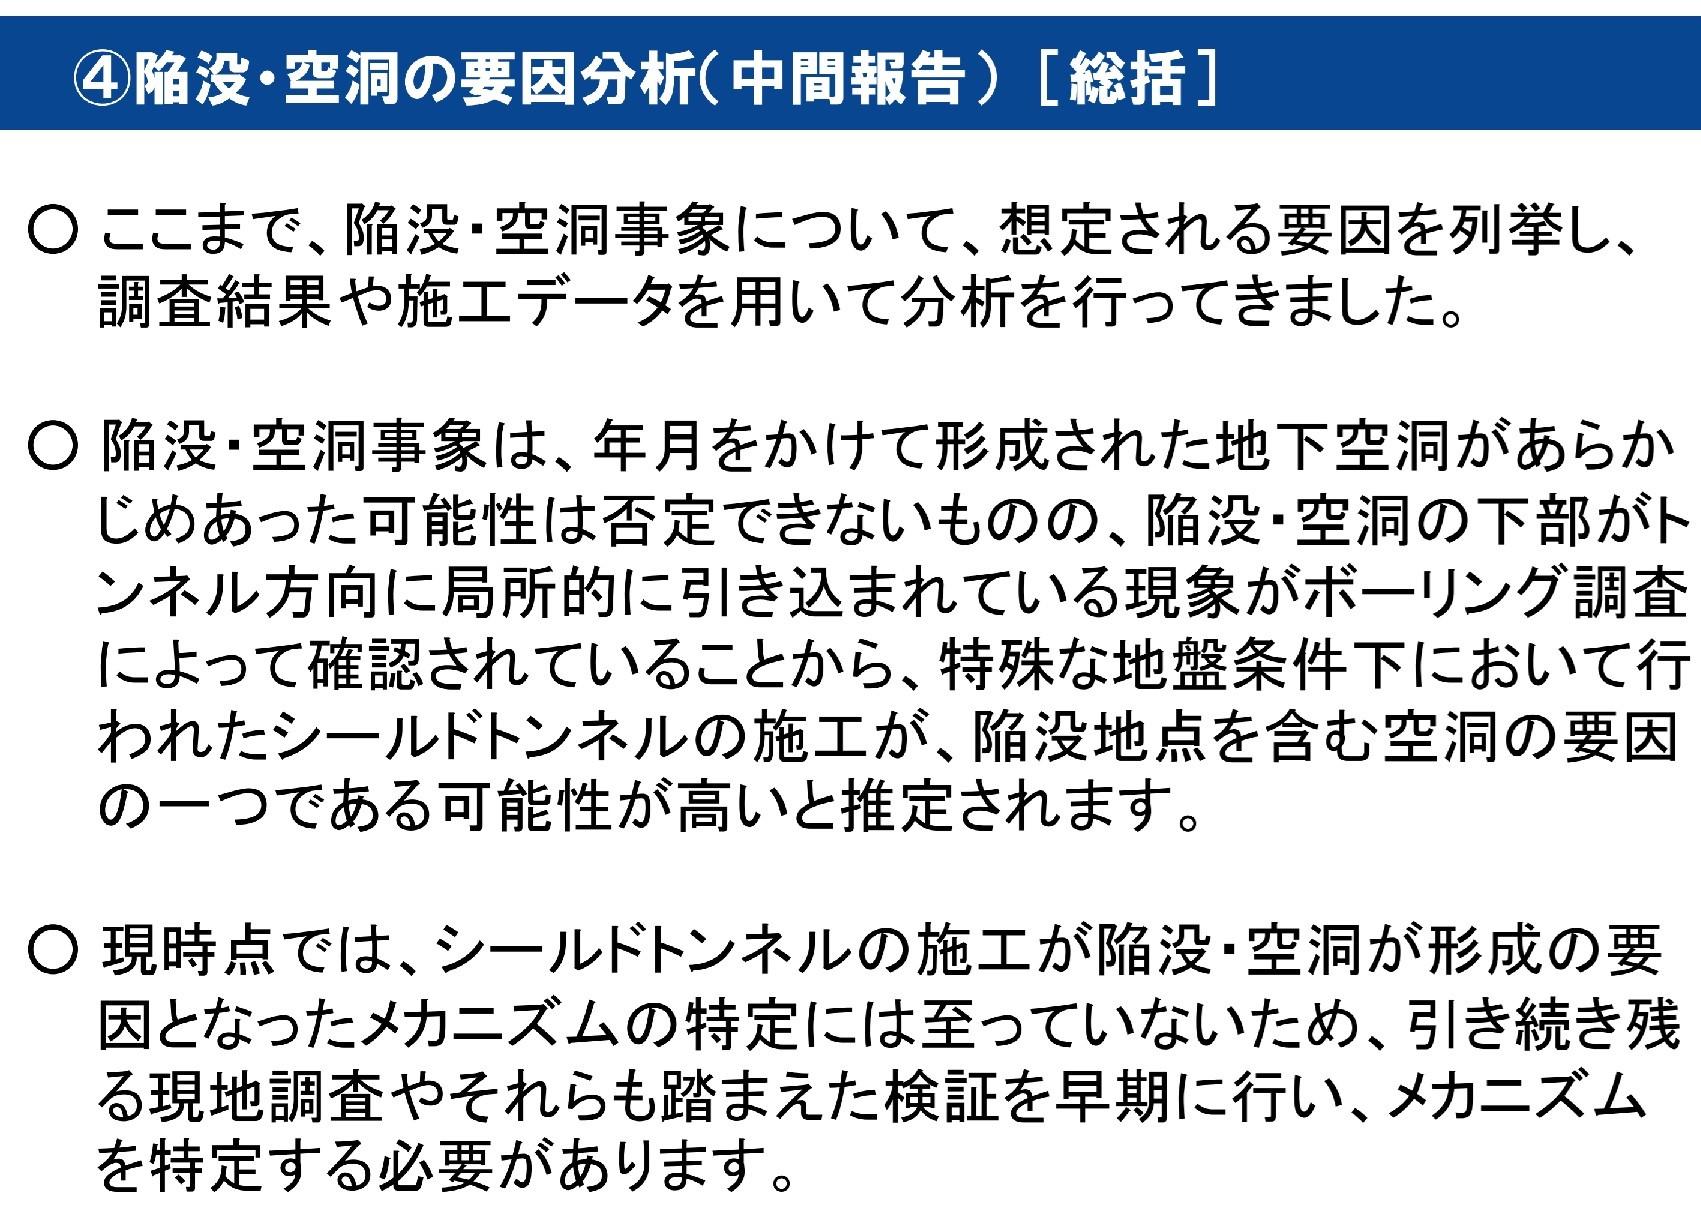 http://yamadakohei.jp/blog_upfile/%E5%A4%96%E7%92%B0%E5%9C%B0%E4%B8%AD%E9%99%A5%E6%B2%A1%E4%B8%AD%E9%96%93%E5%A0%B1%E5%91%8A2.jpg